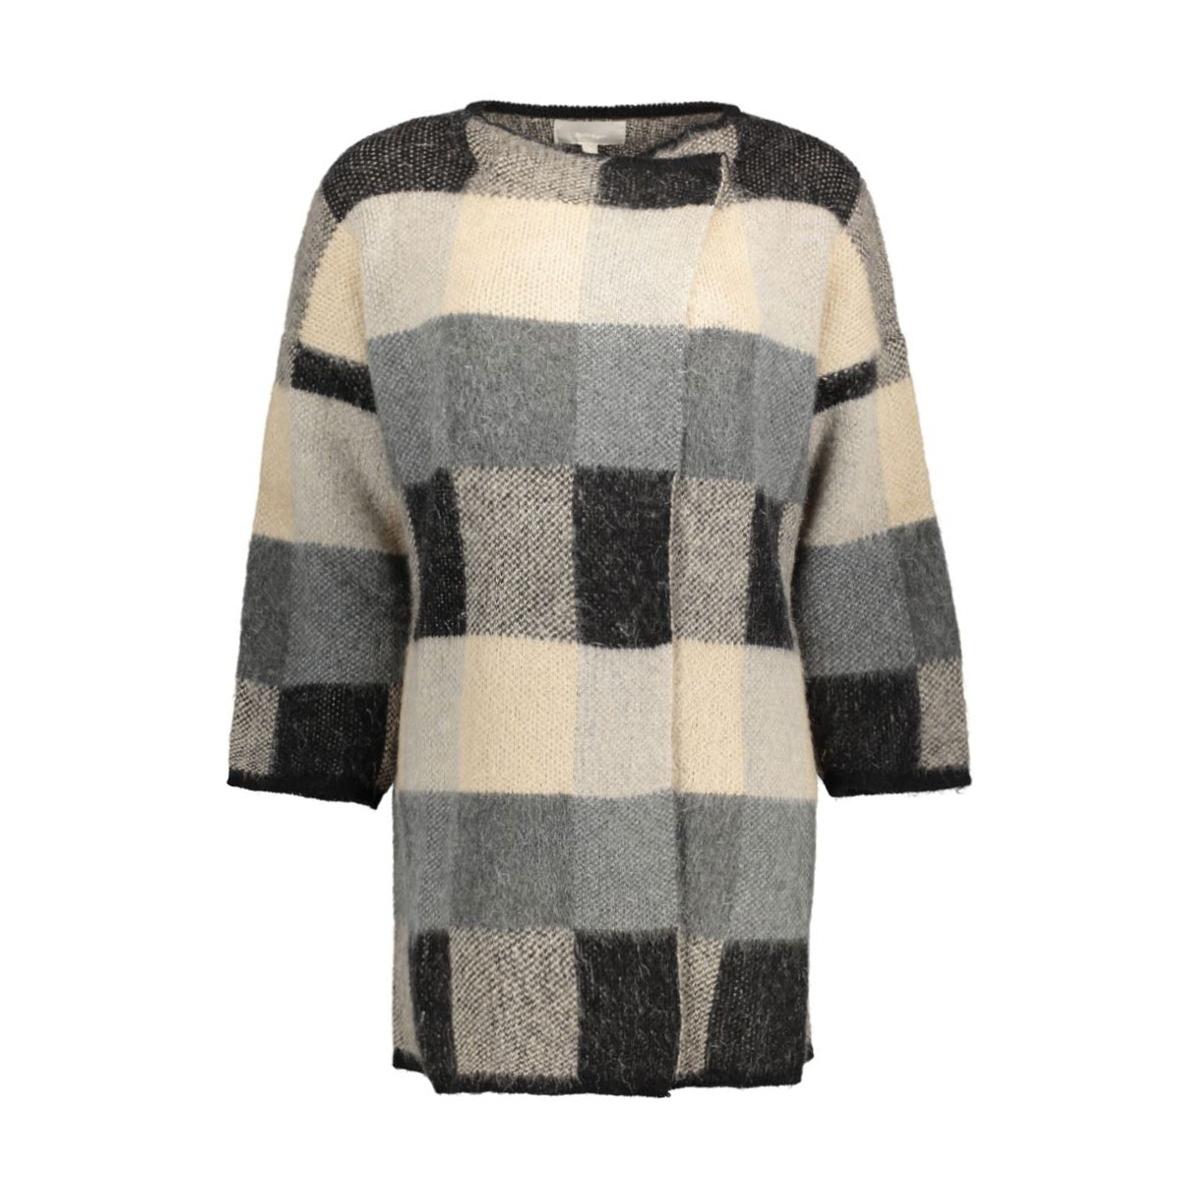 tini cardigan 30101130 inwear vest 10050